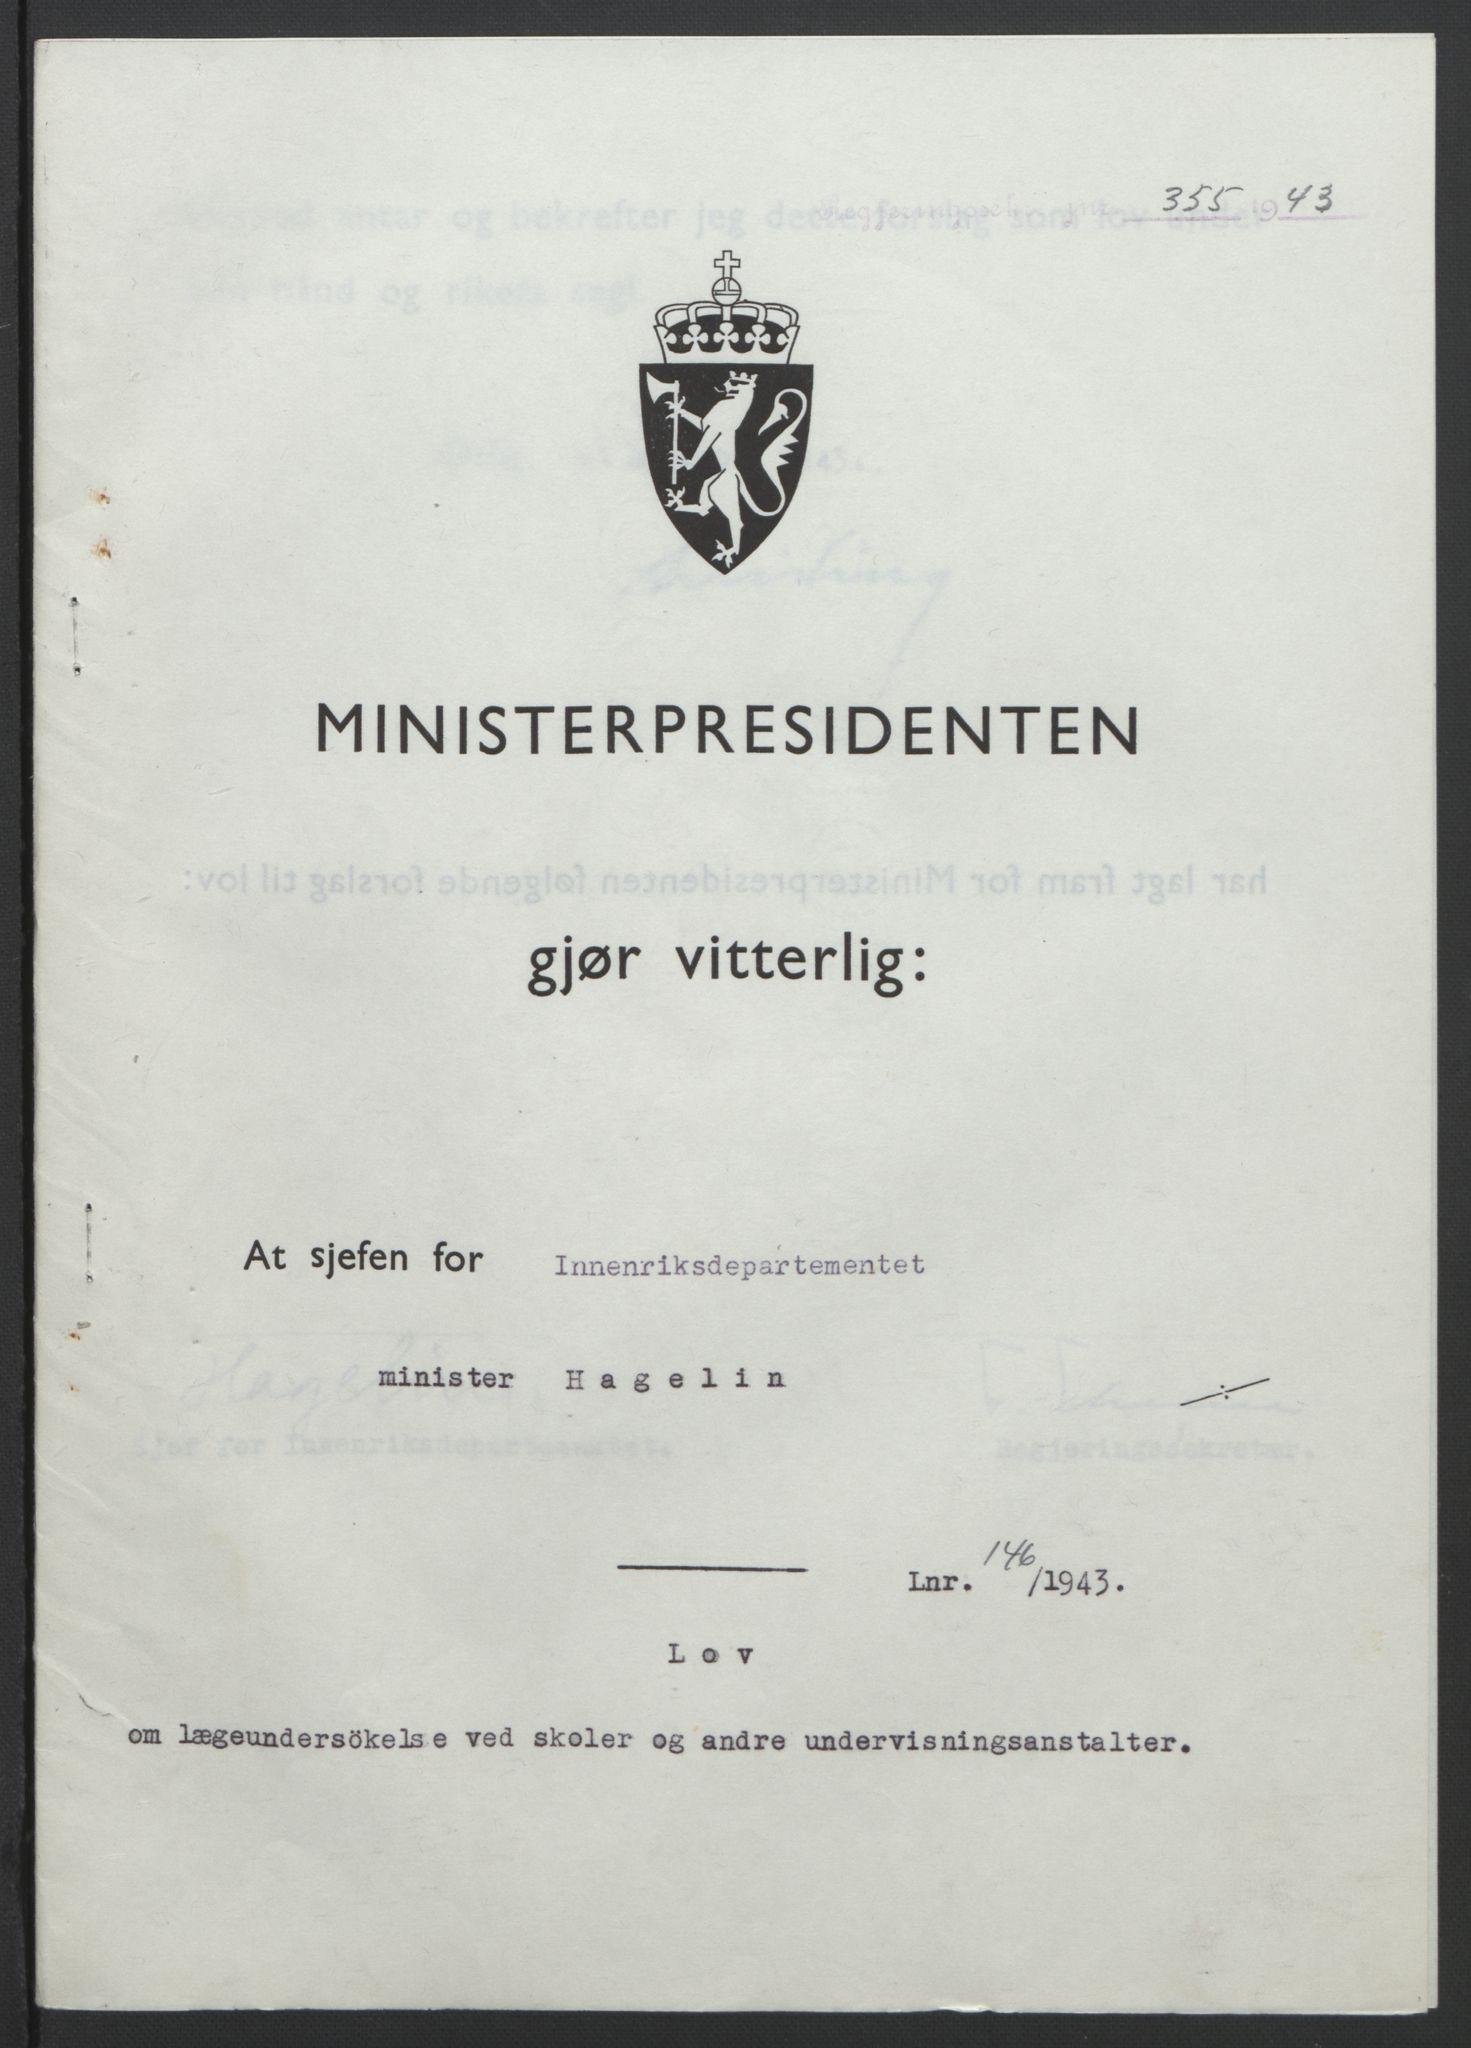 RA, NS-administrasjonen 1940-1945 (Statsrådsekretariatet, de kommisariske statsråder mm), D/Db/L0099: Lover, 1943, s. 680